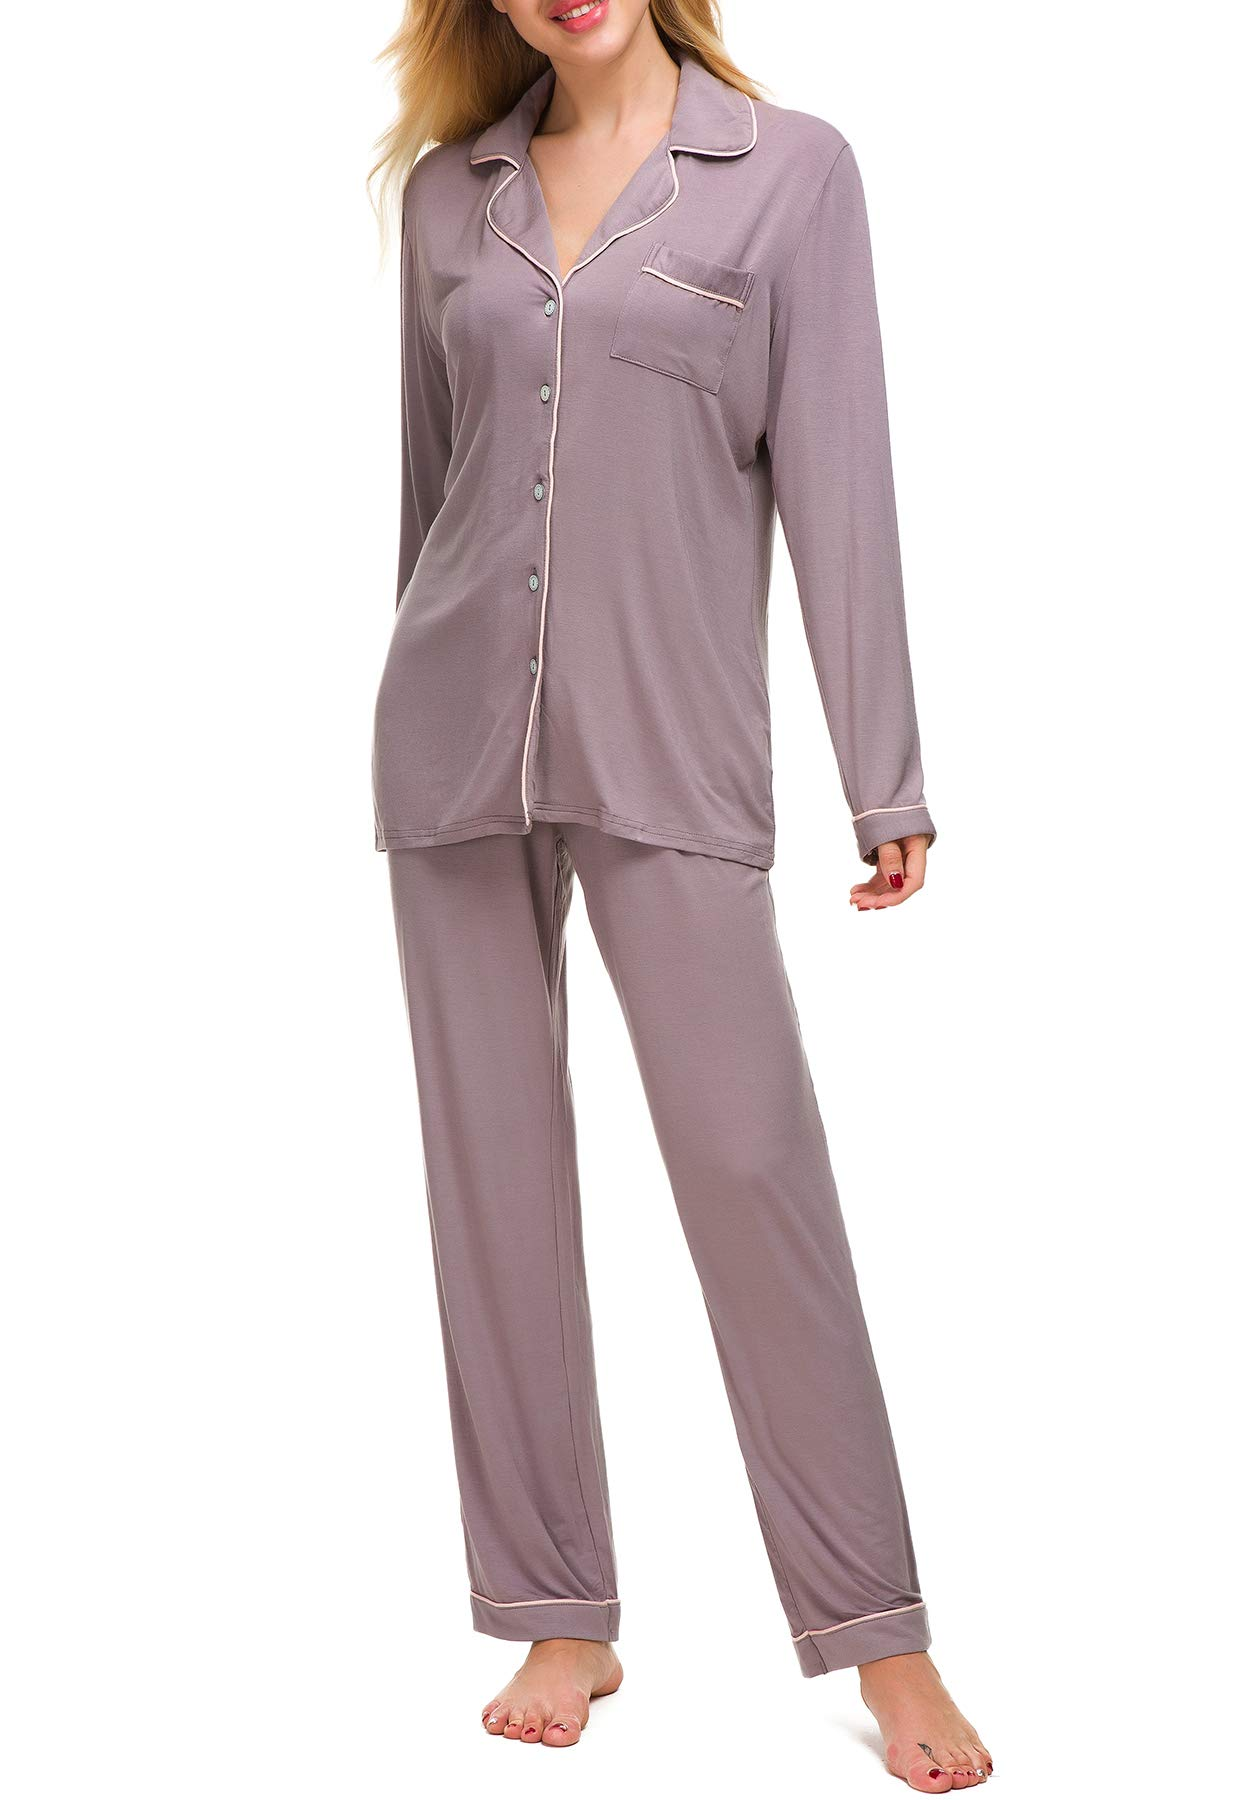 Aviier Long Sleeve Pajamas for Women Cotton Lounge Sleepwear X-Large (Gray, XL)